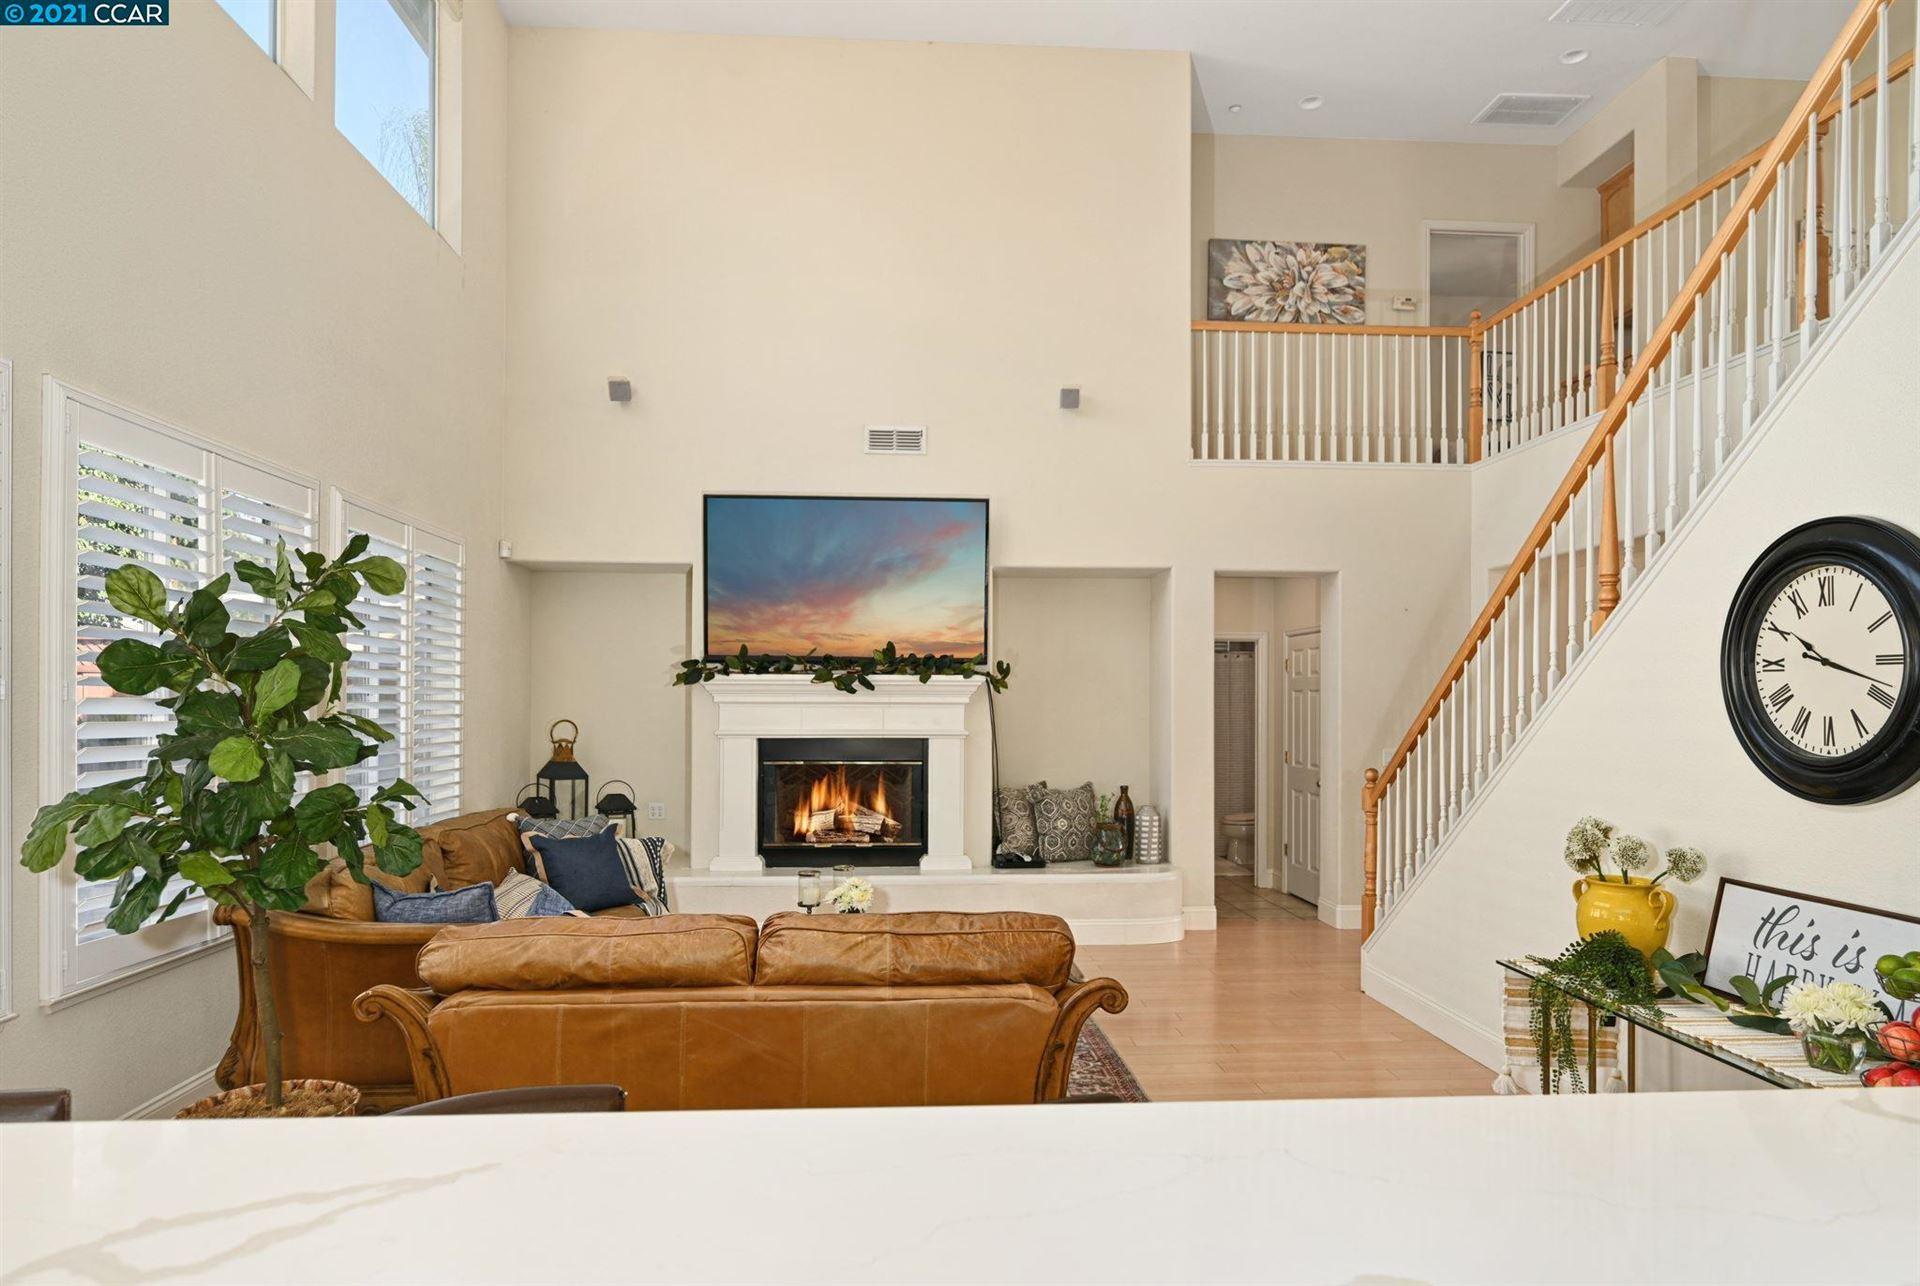 Photo of 2859 Gardenside Ct, Brentwood, CA 94513 (MLS # 40970381)